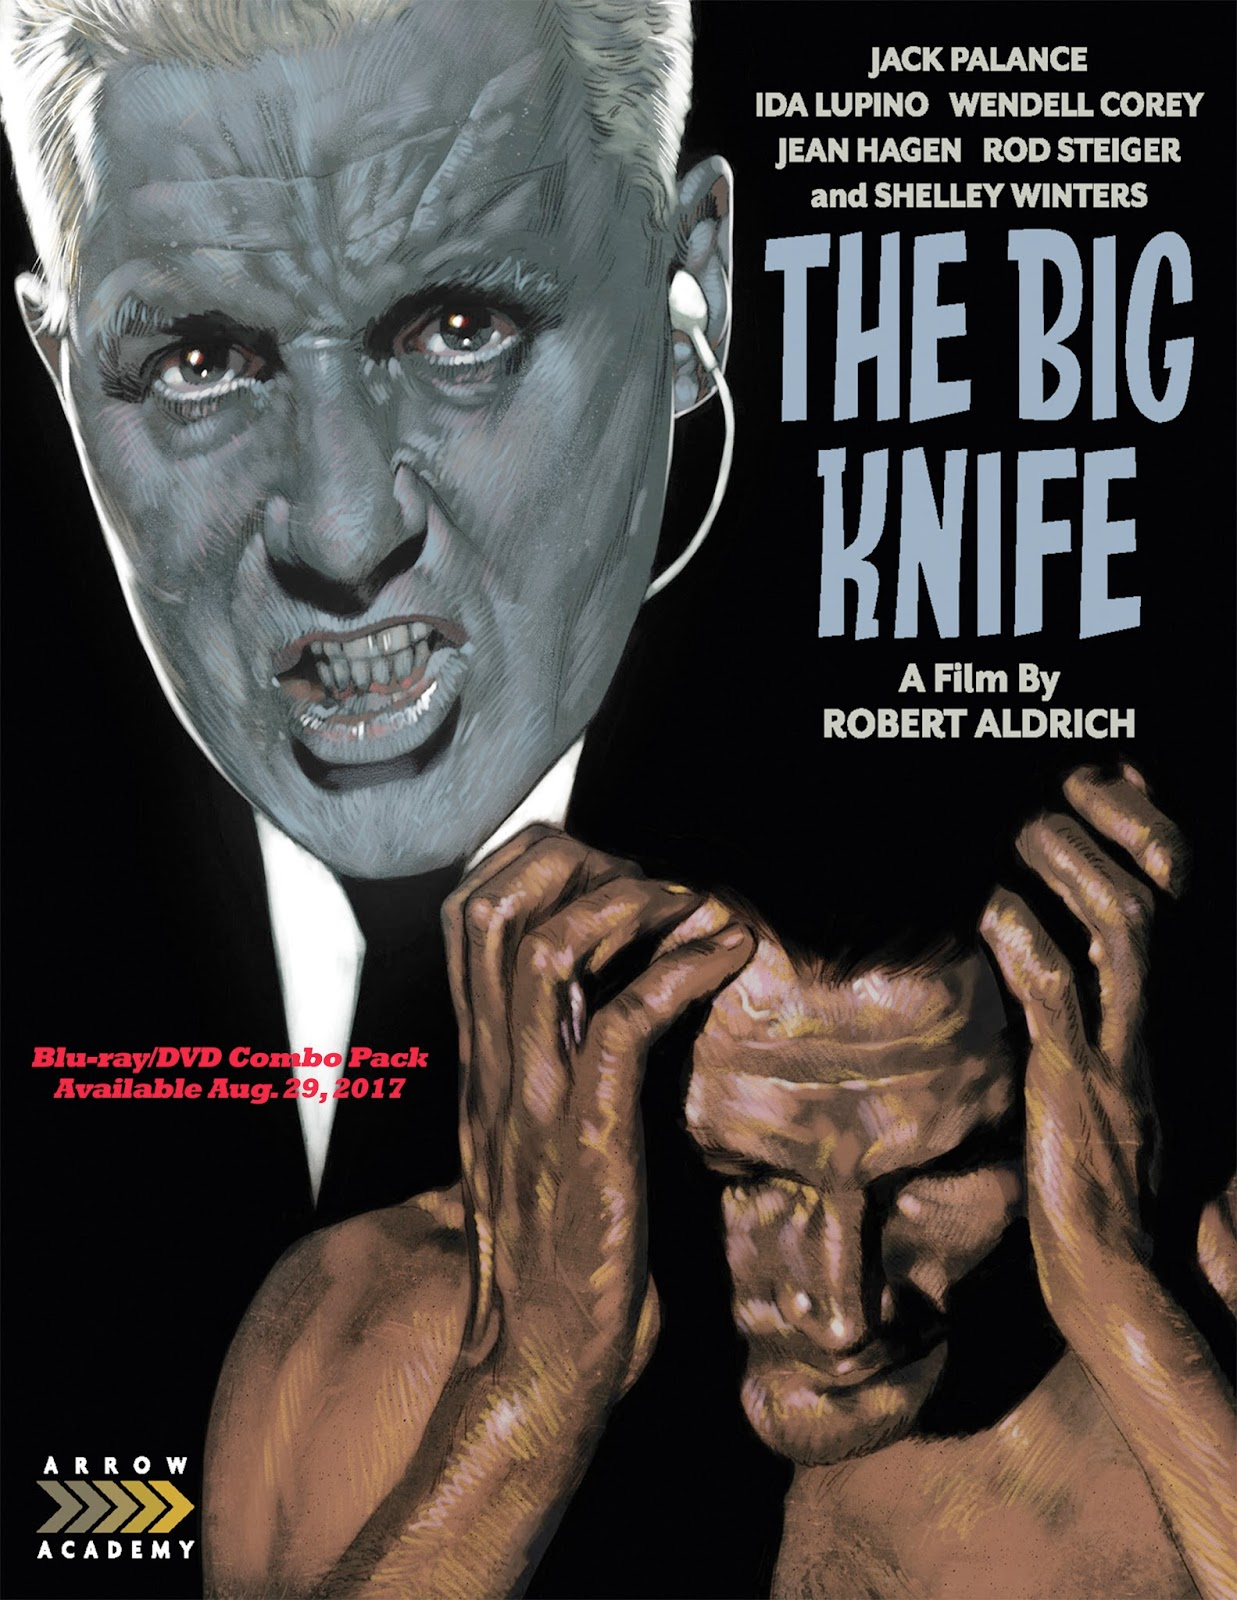 Jack Palance Filmes Ideal jack palance, arrow academy, and their big knife - the farsighted